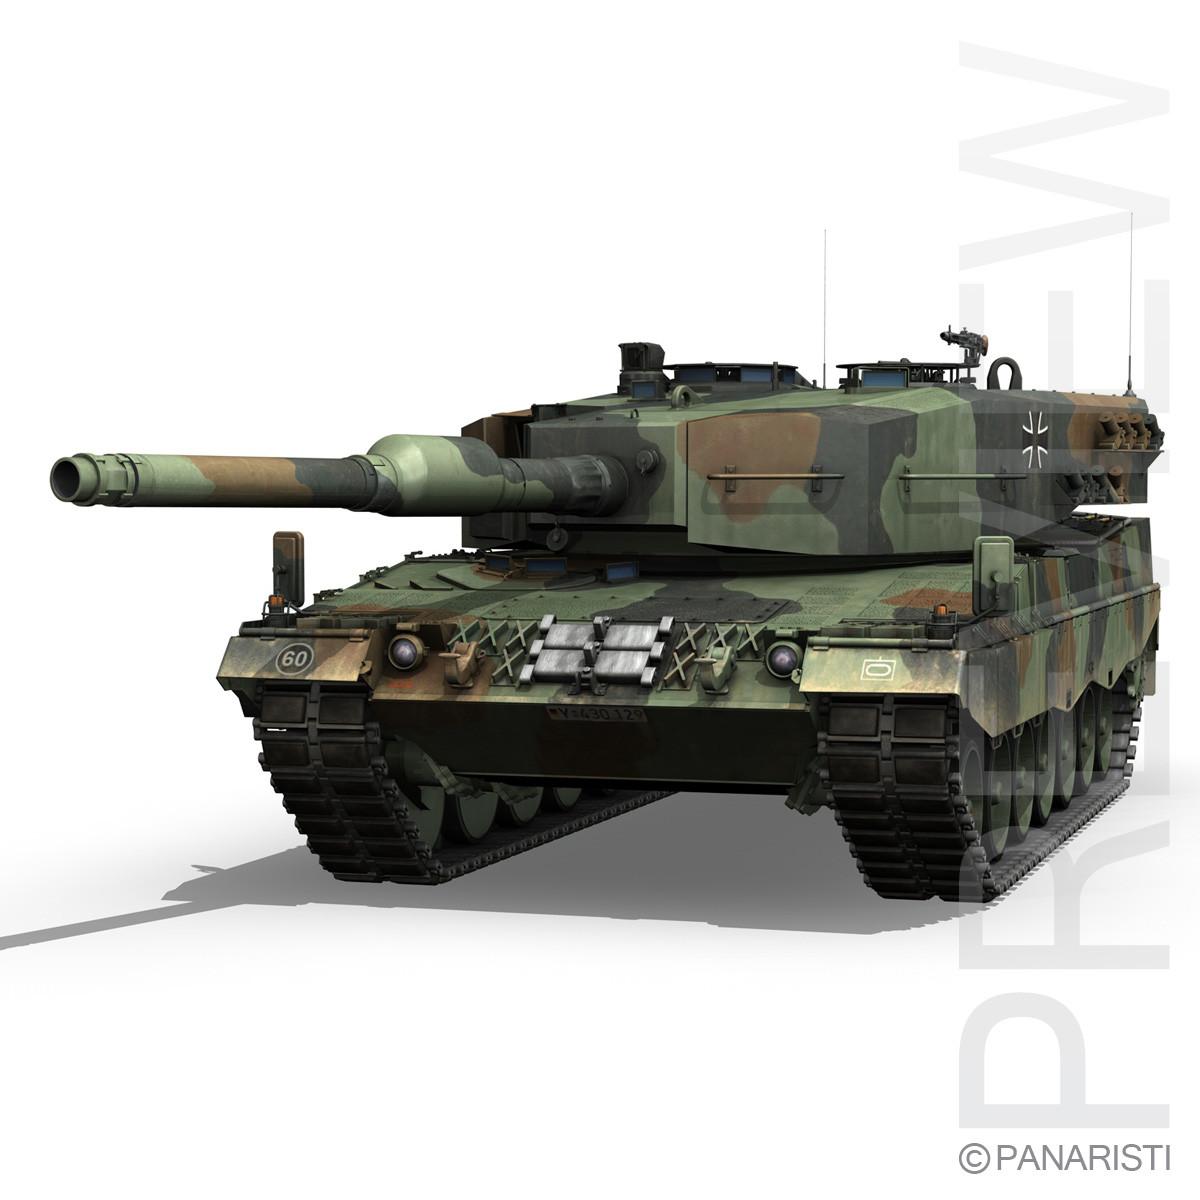 Leopard 2A4 MBT - Germany